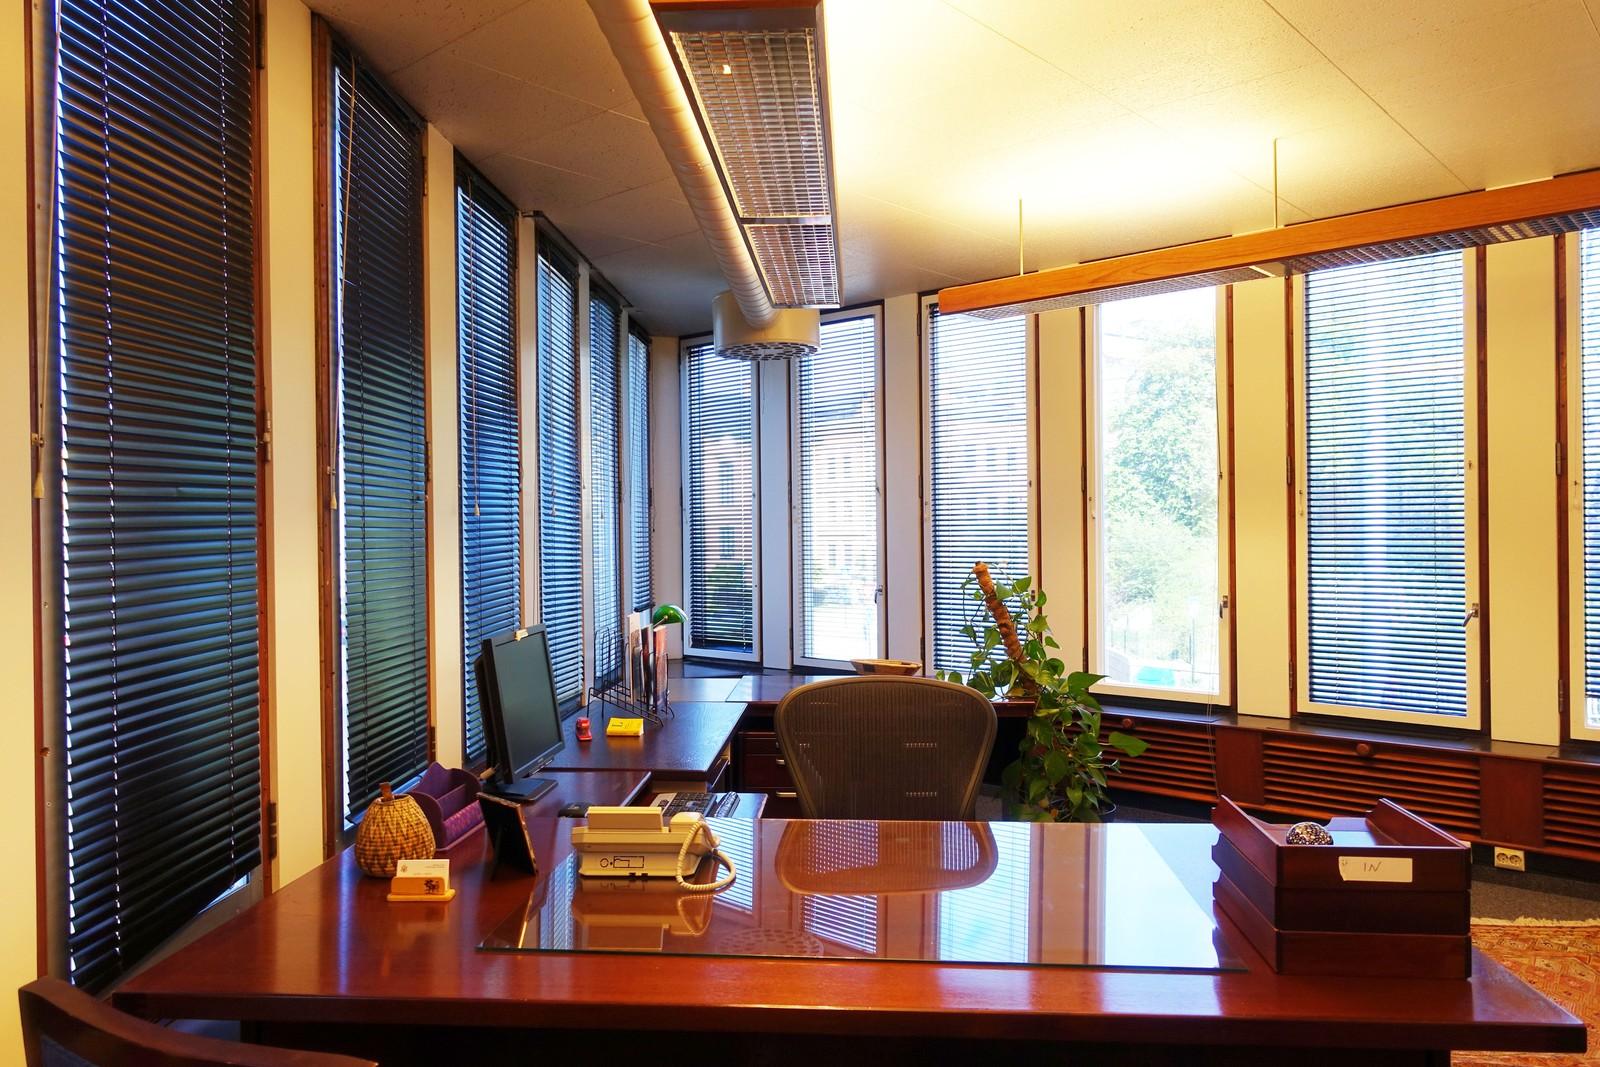 Alle hjørnekontorene i bygget har en trekantet form. Dette er kontoret til lederen i presseavdelingen. Ambassadørens kontor har den samme formen, men er mye større.